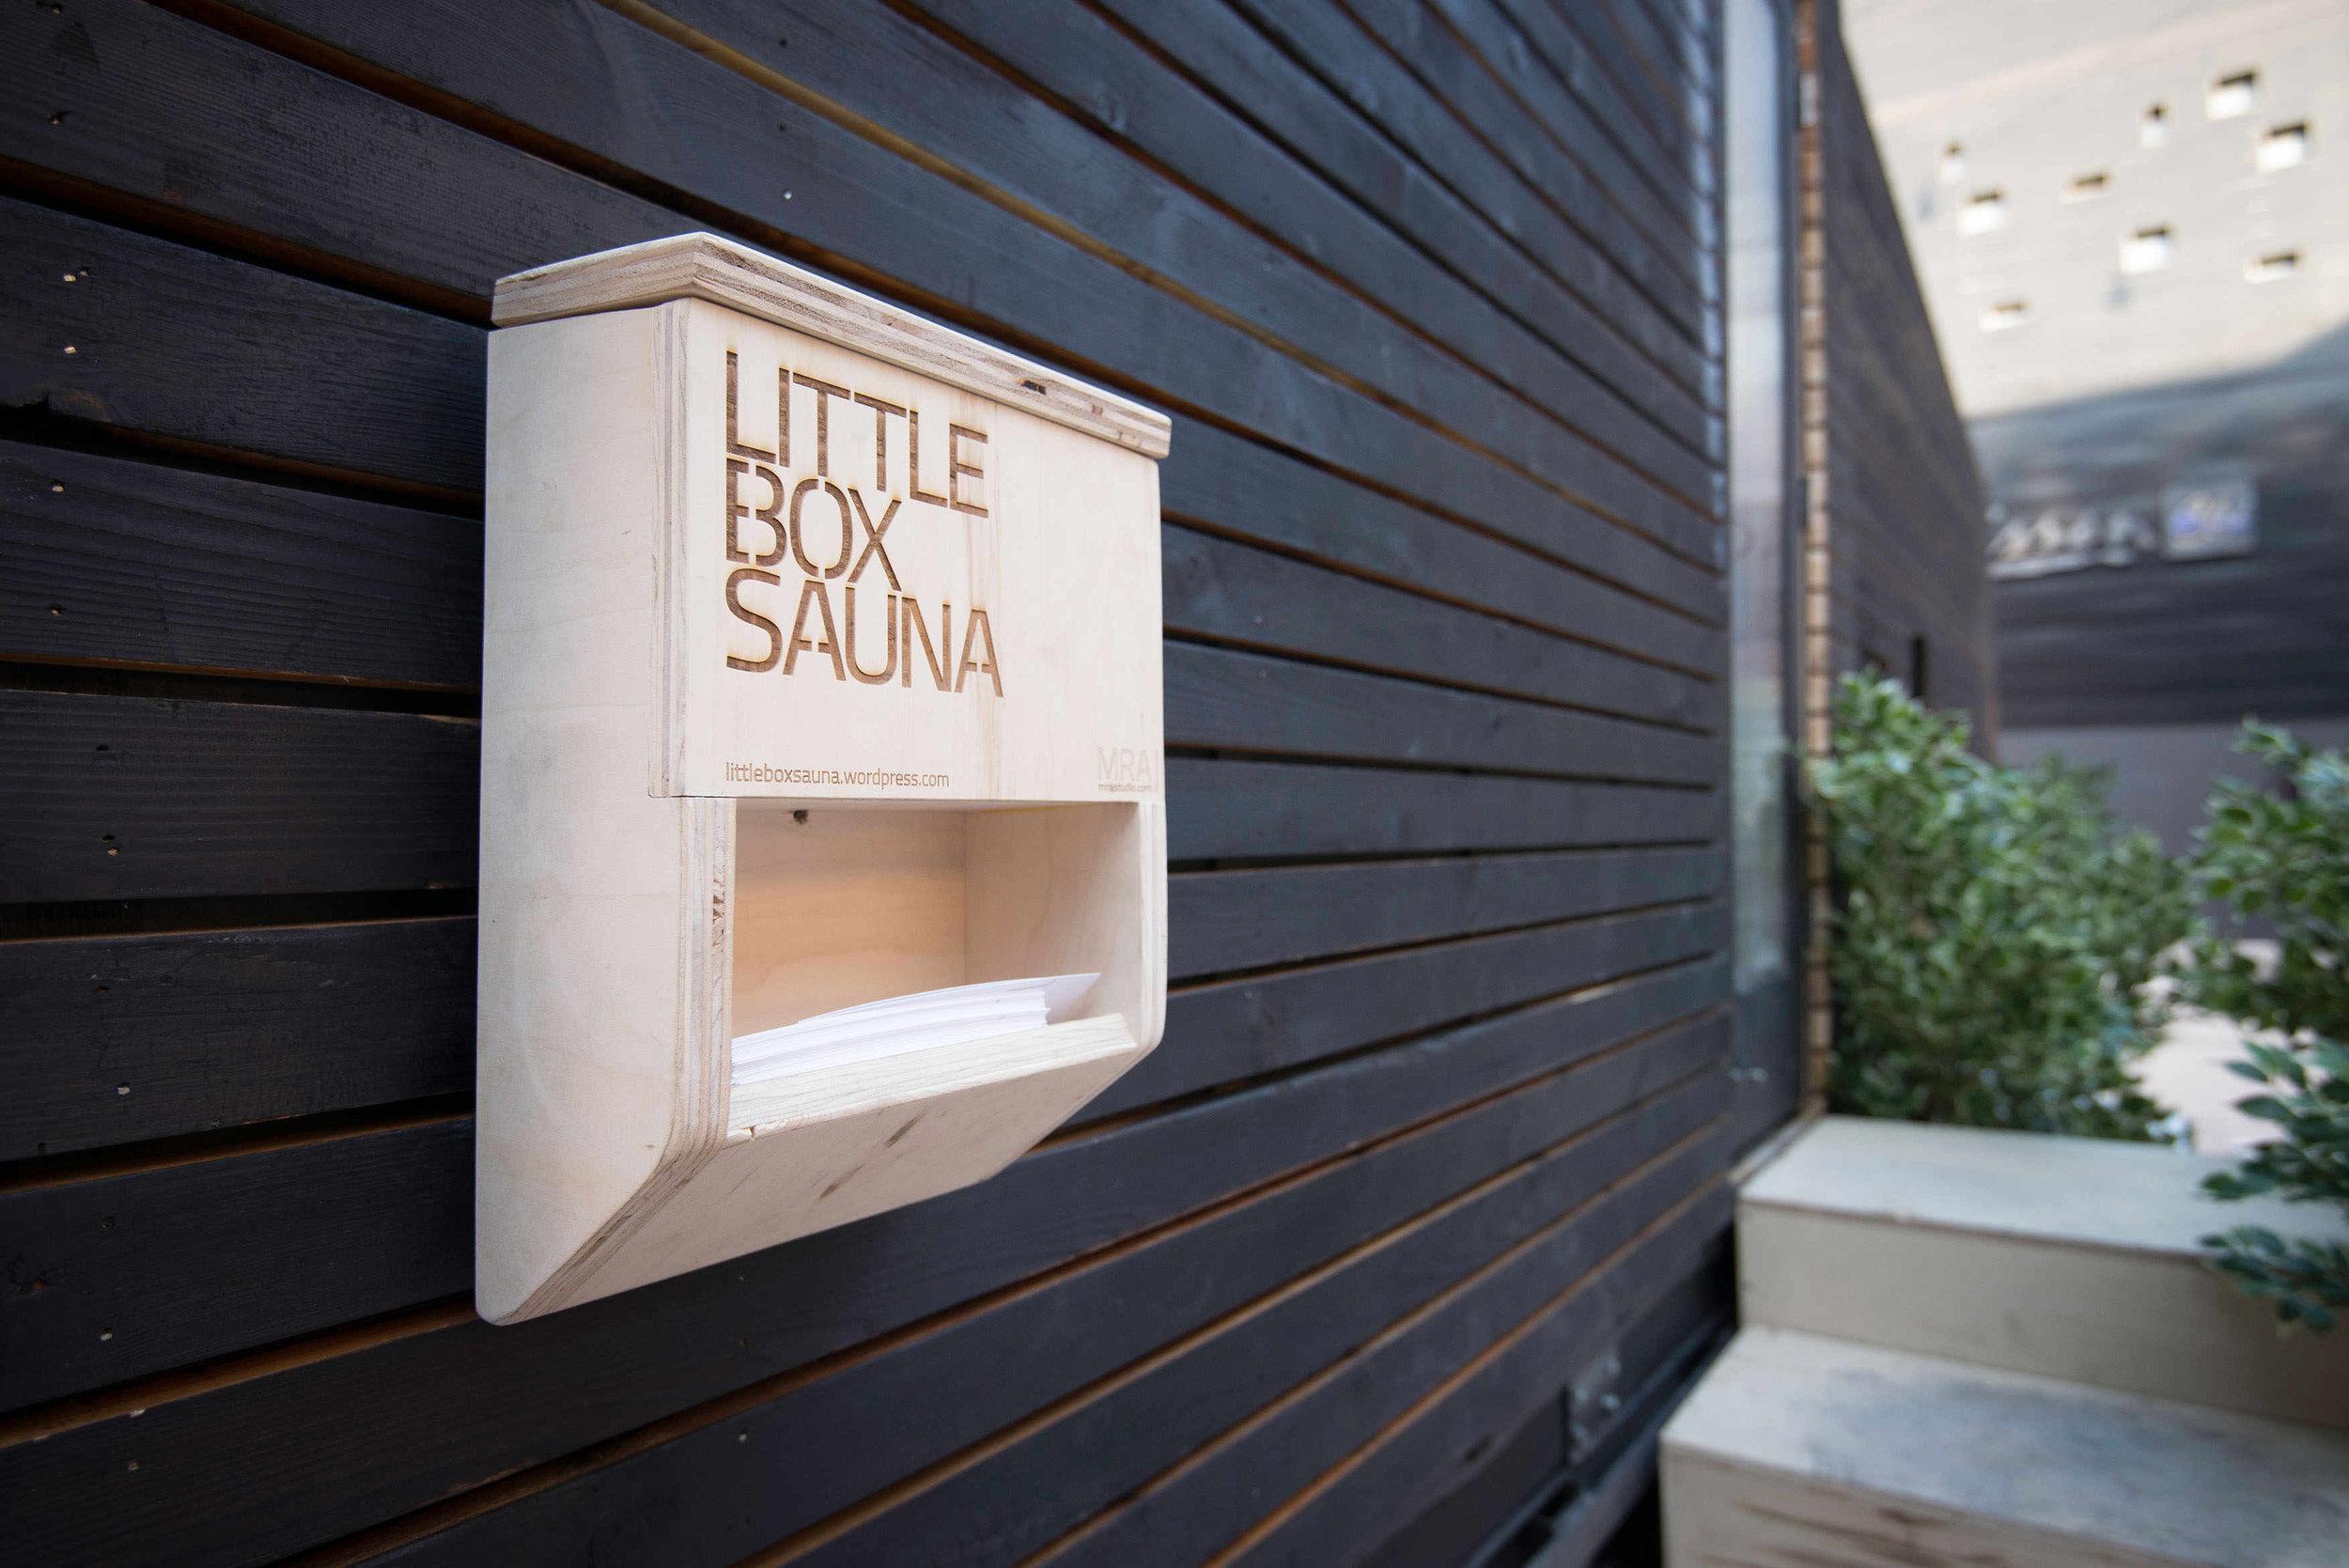 little-box-suana-0005.jpg